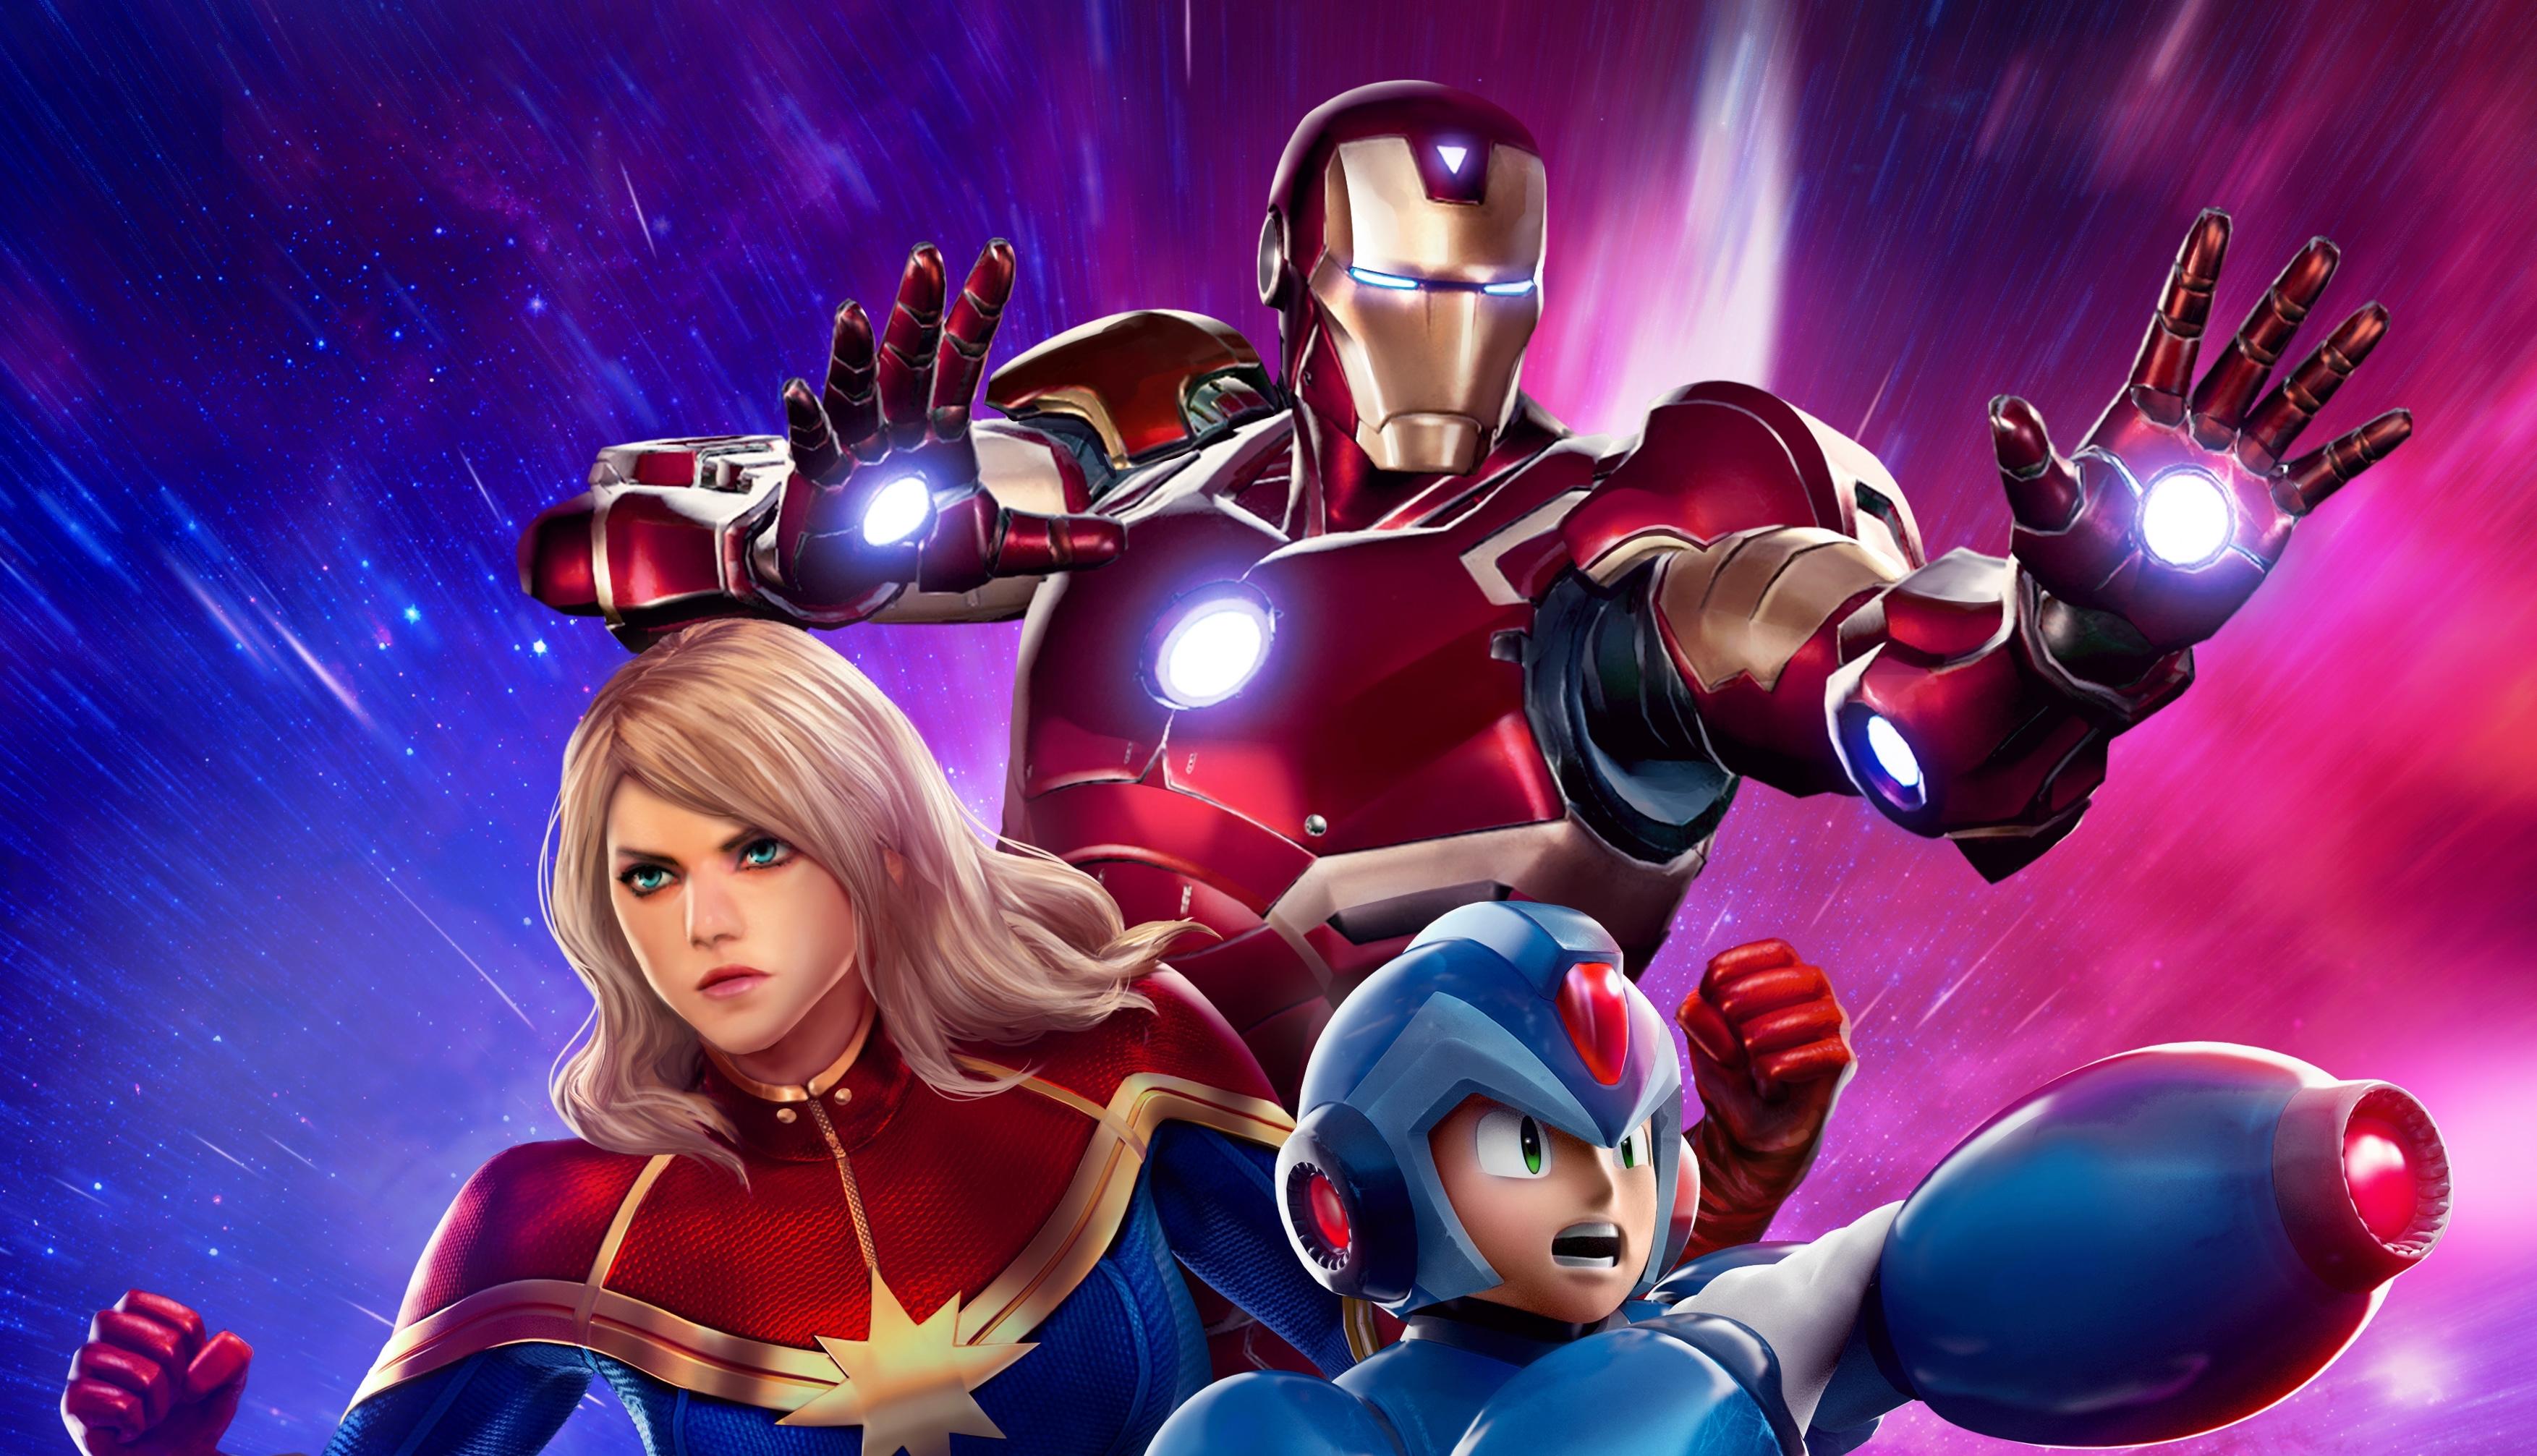 marvel vs capcom infinite story, hd games, 4k wallpapers, images